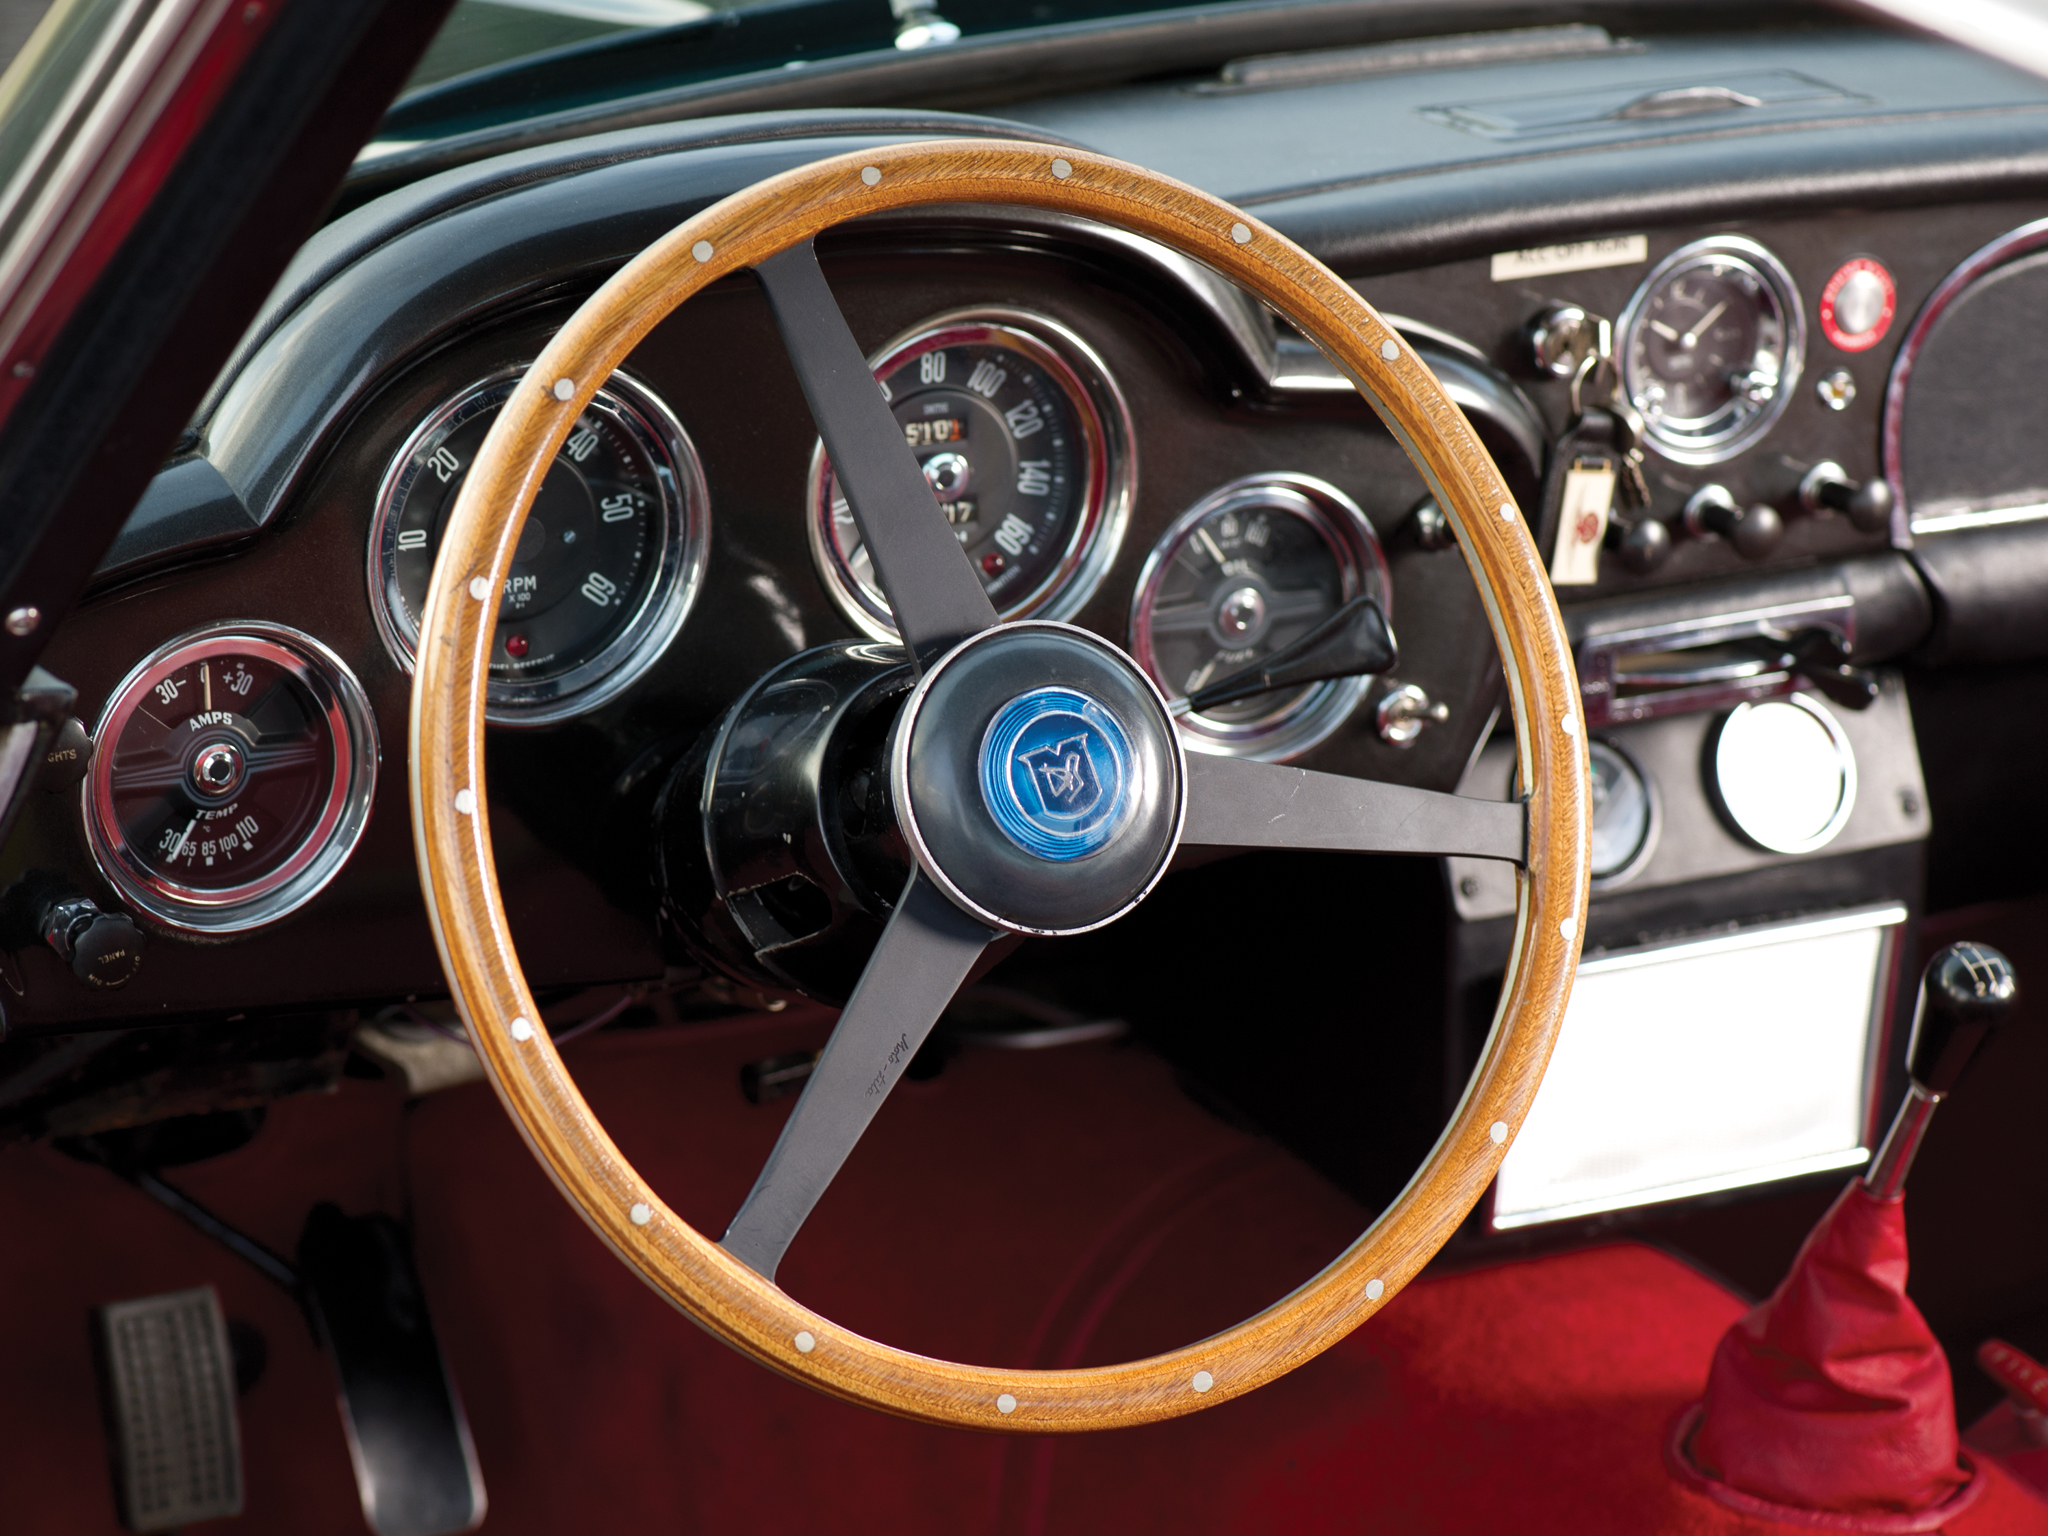 1961 Aston Martin Db4 Lightweight Racer Series Iv Supercar